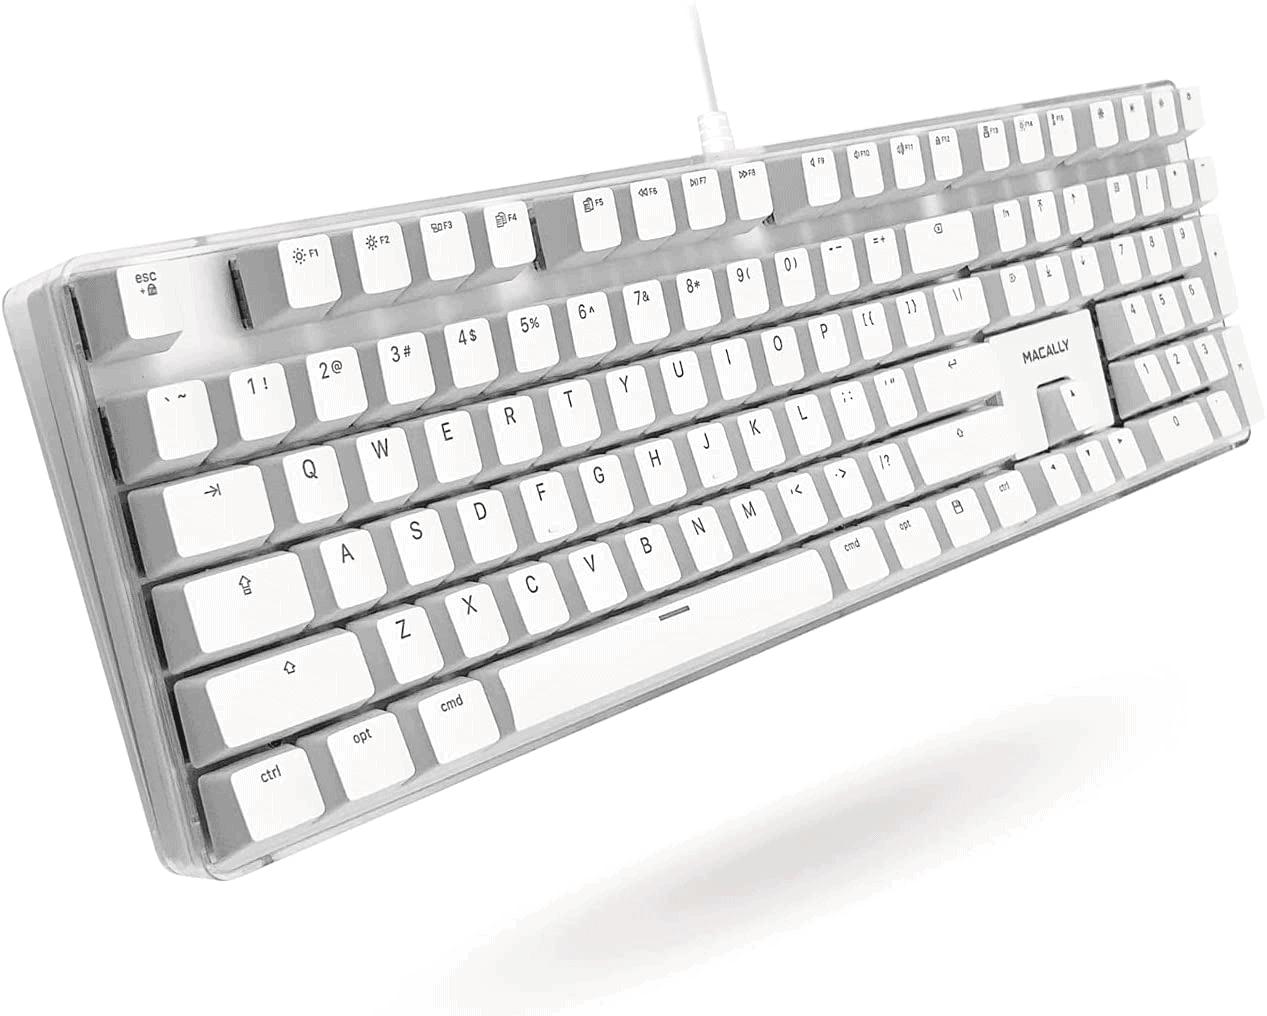 mac mechanical keyboard reddit